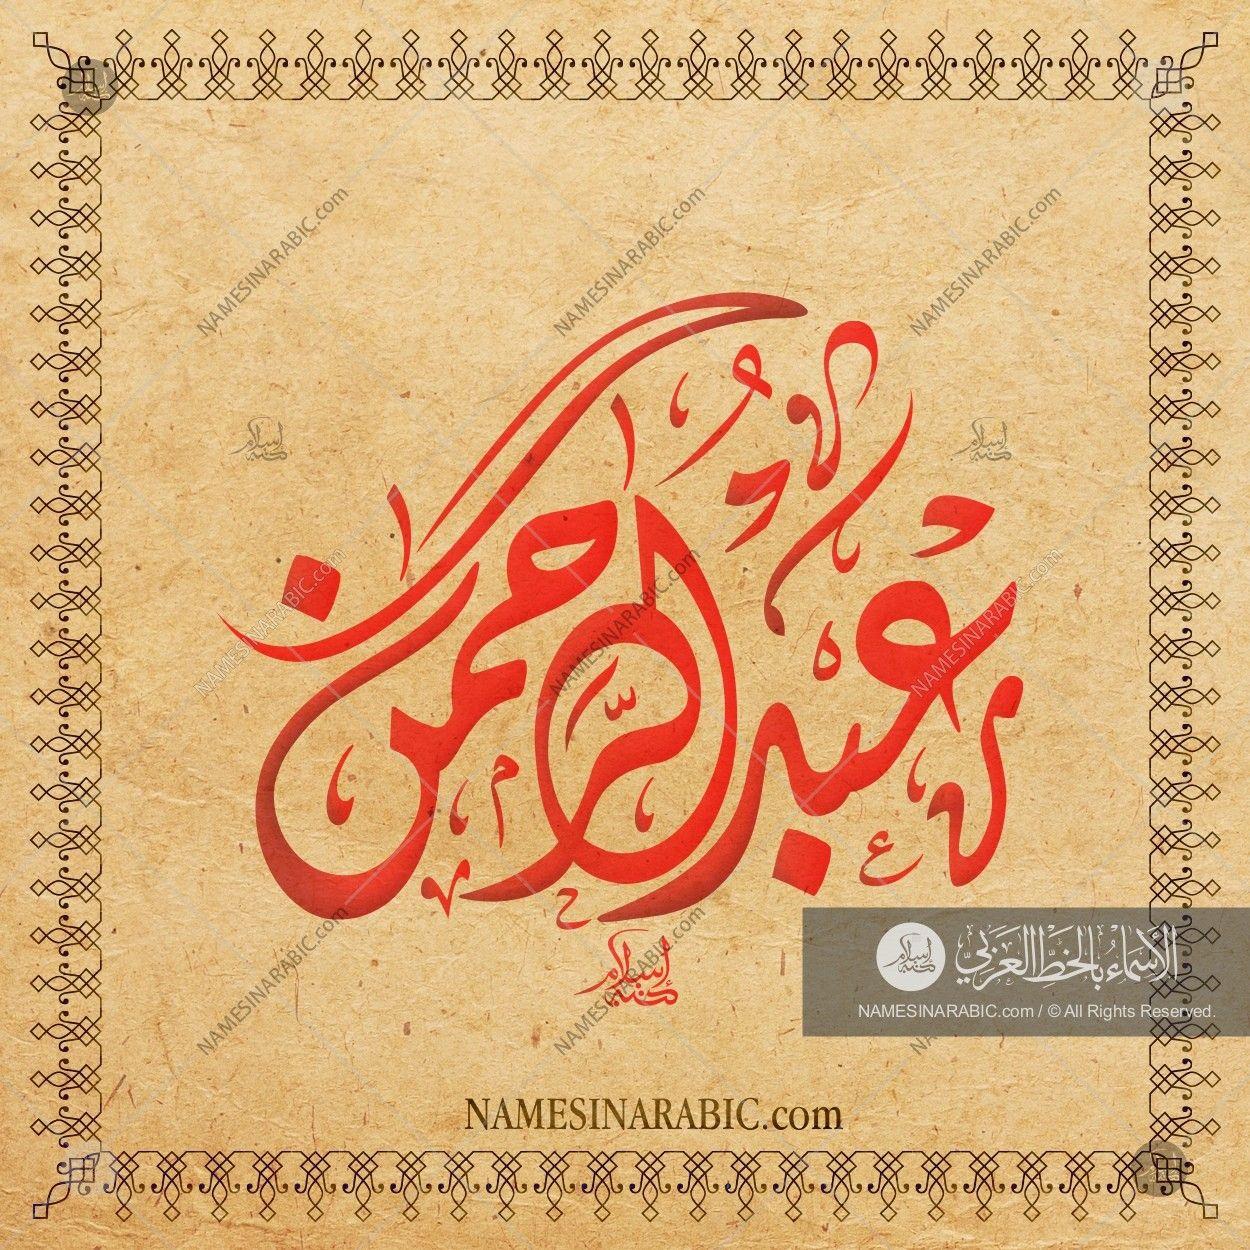 Abdul Rahman عبد الرحمن Names In Arabic Calligraphy Name 5627 Arabic Calligraphy Design Islamic Art Calligraphy Calligraphy Name